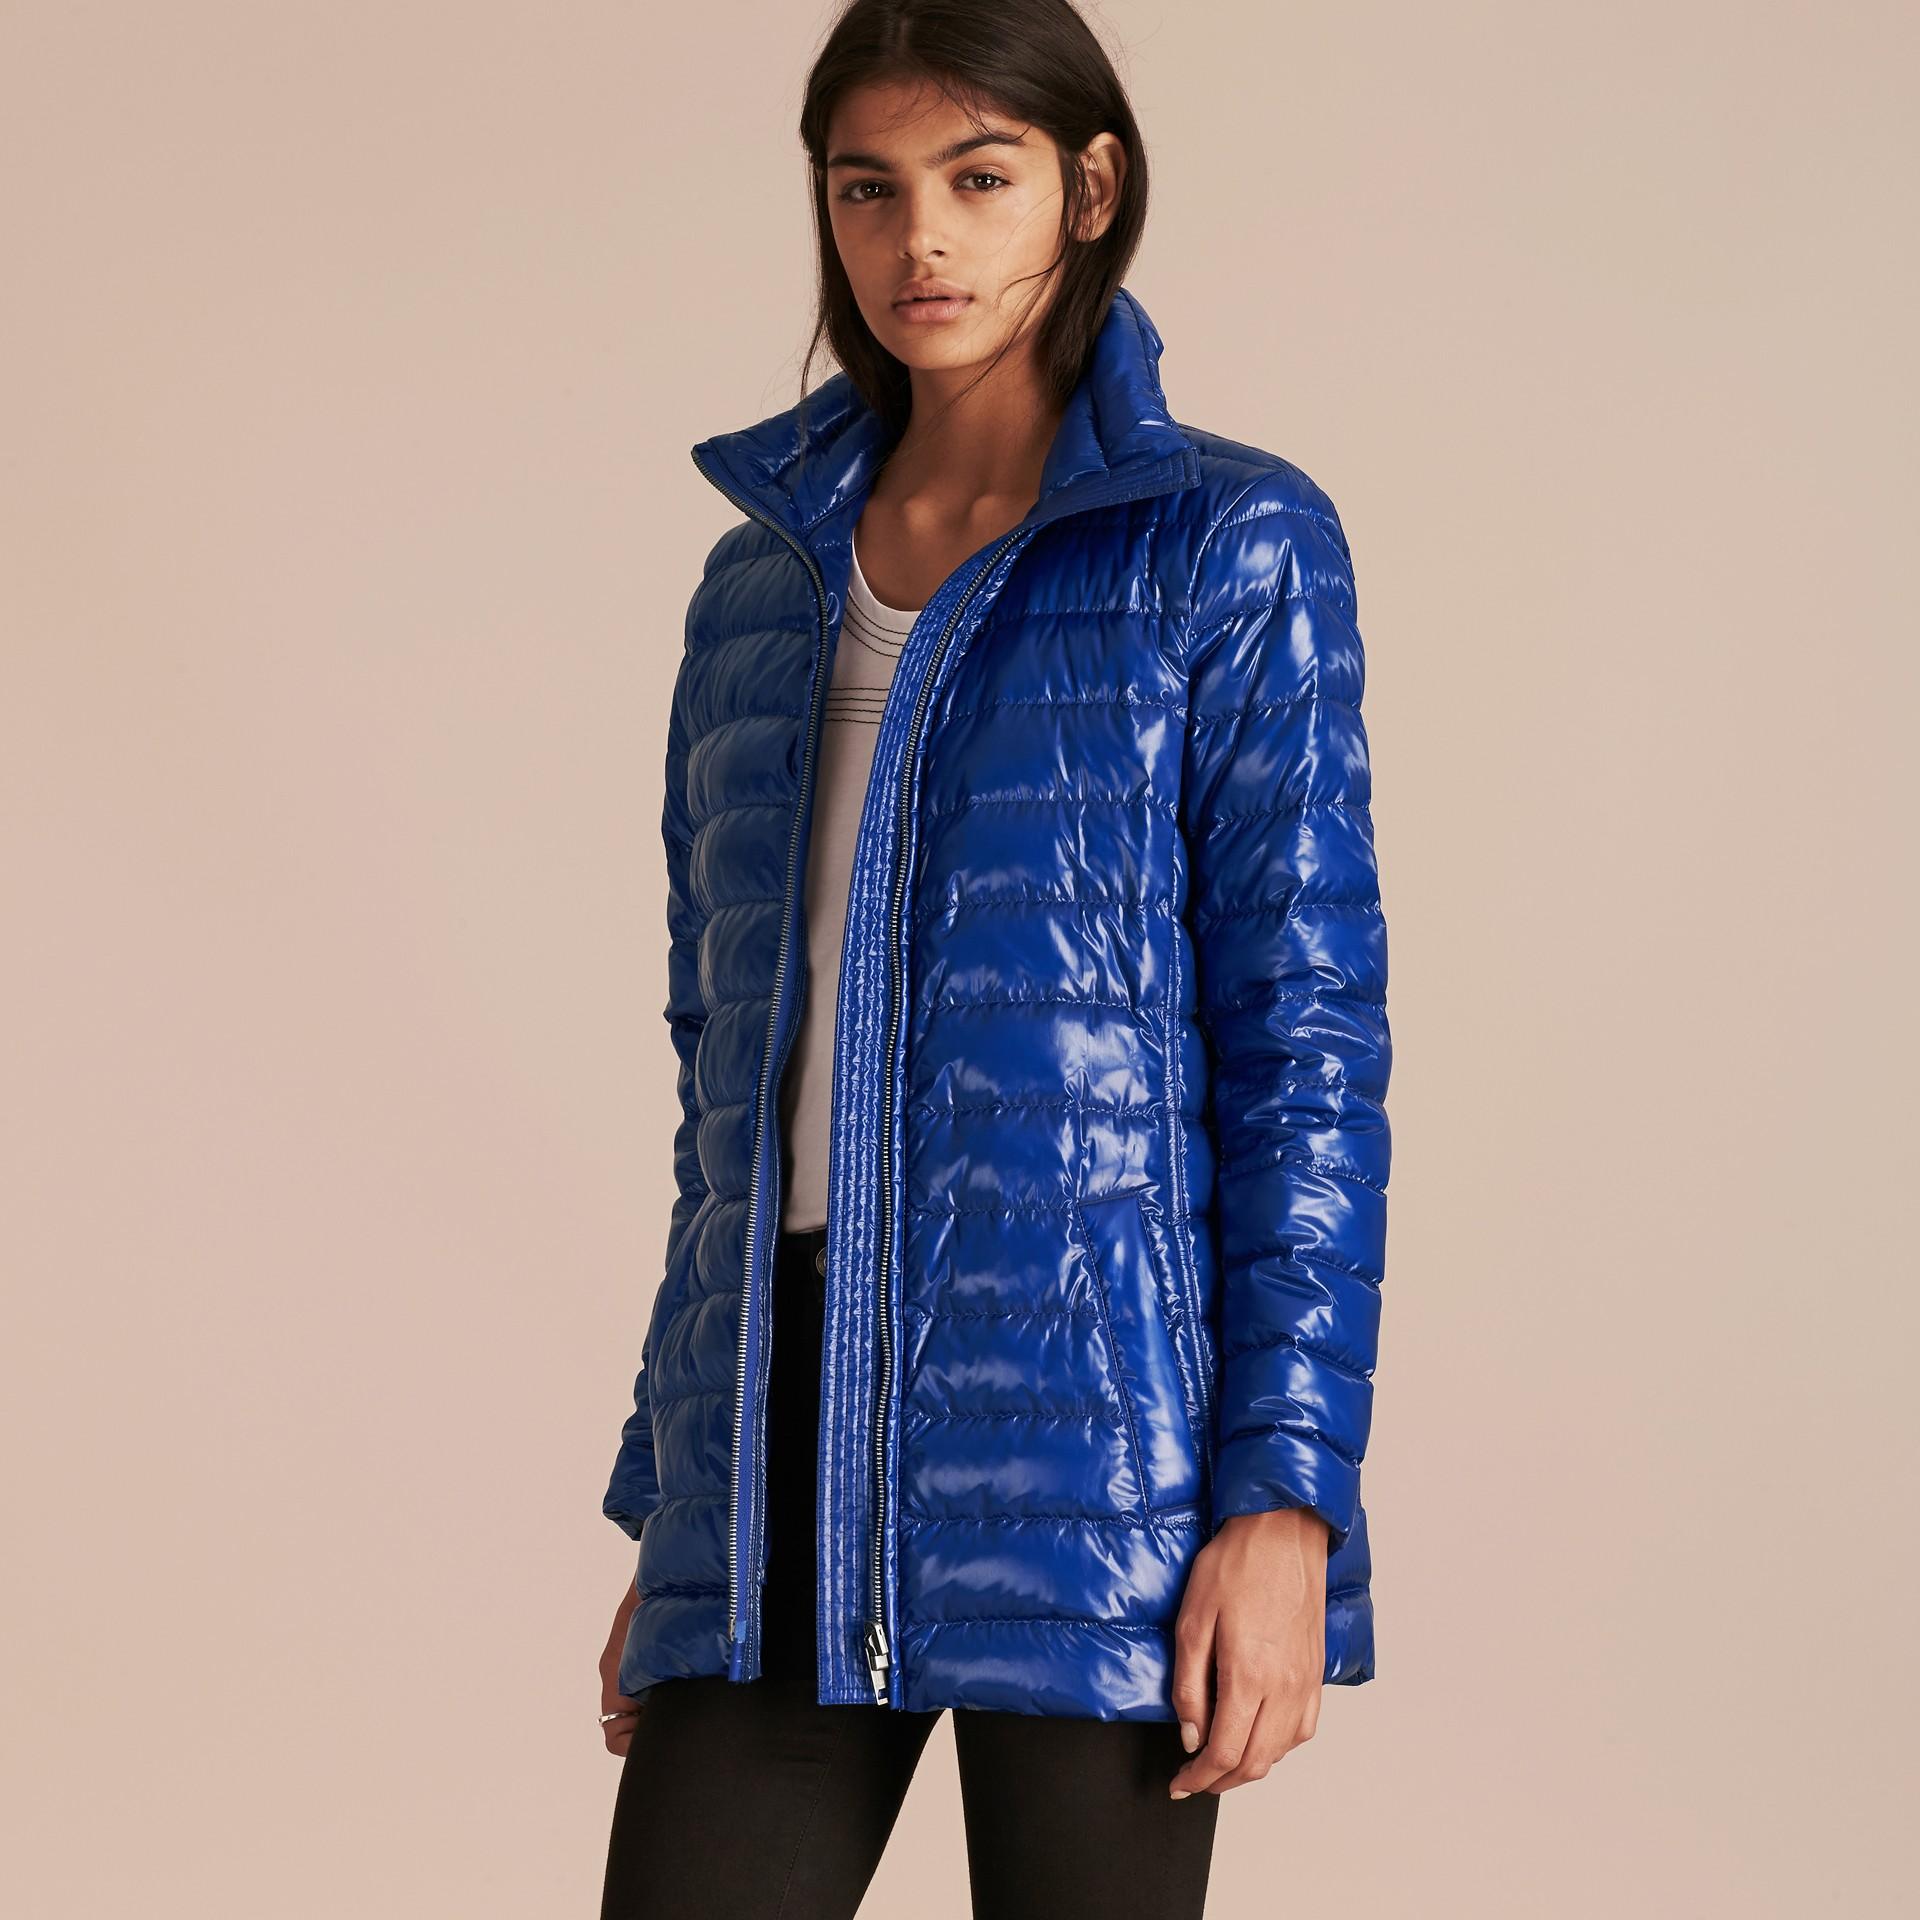 Ink blue Fur-trimmed Parka with Detachable Down-filled Jacket Ink Blue - gallery image 7